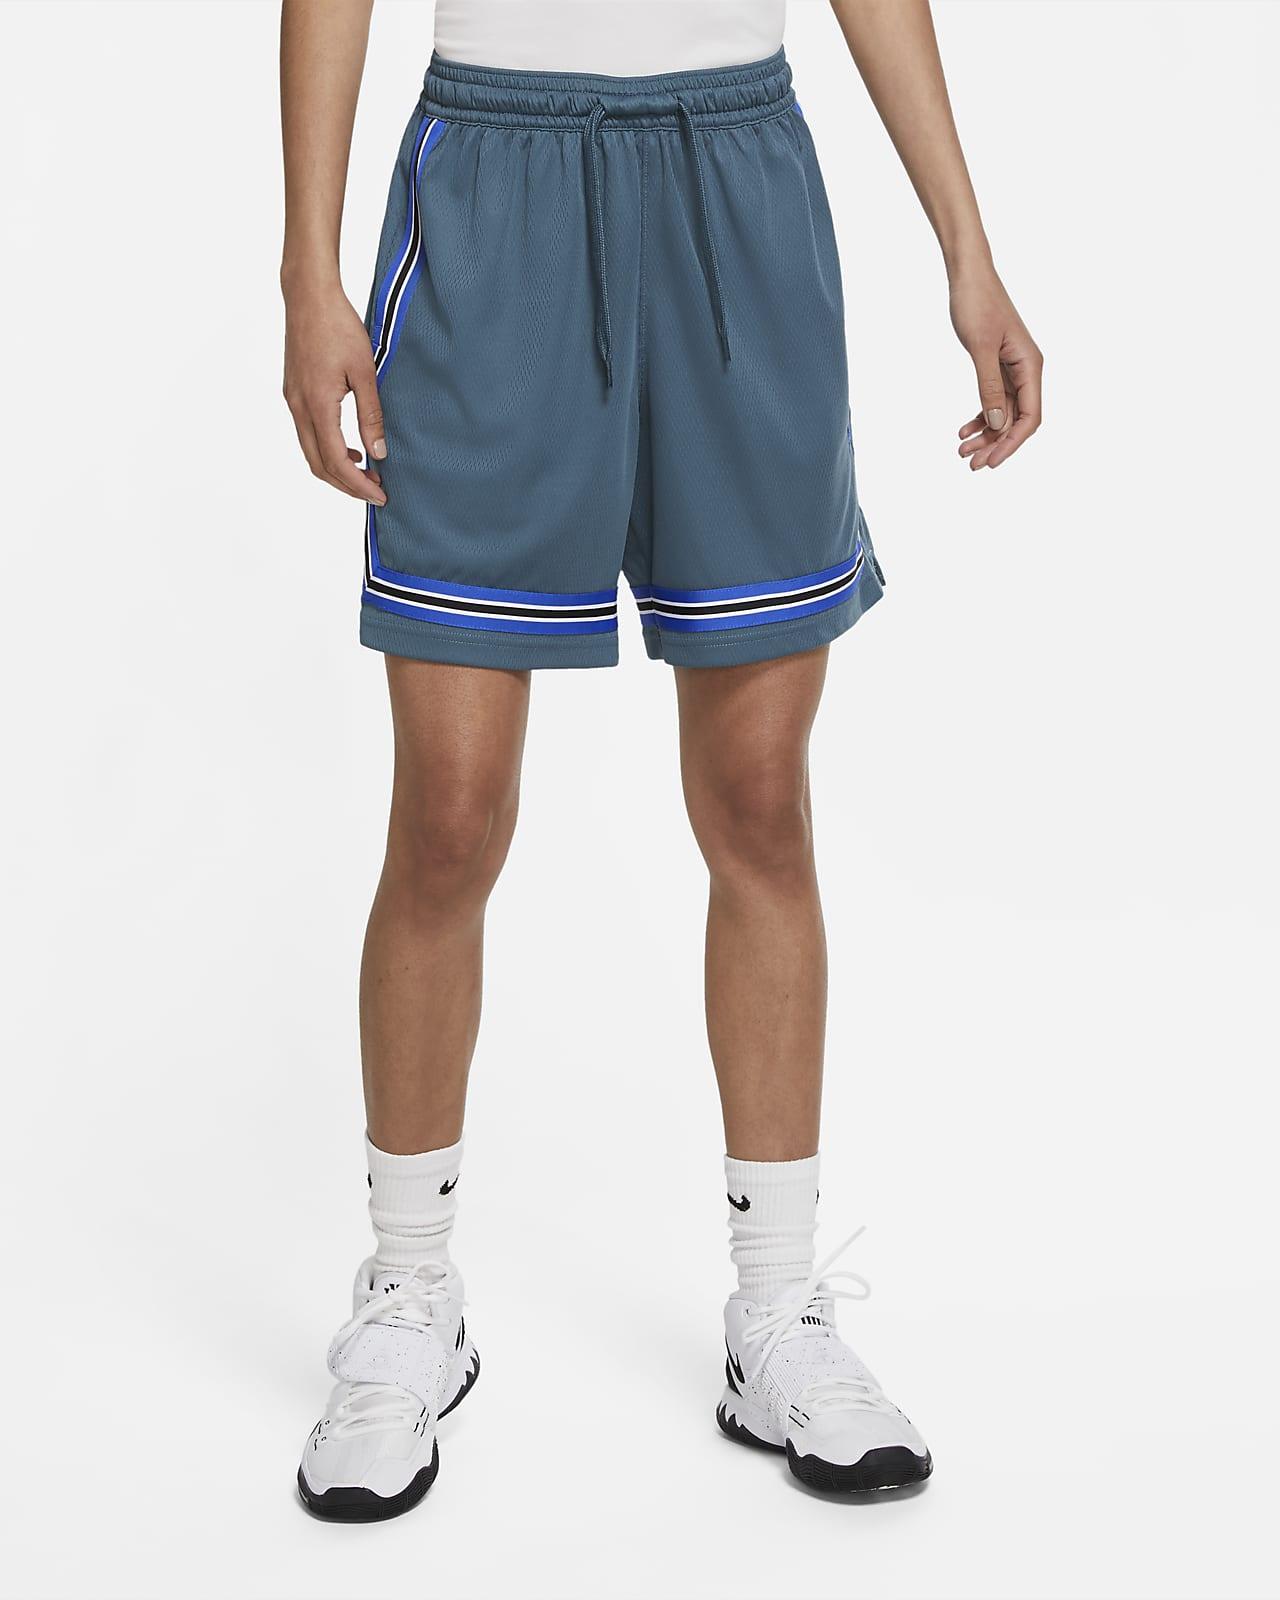 Nike Dri-FIT Swoosh Fly-basketballshorts til kvinder